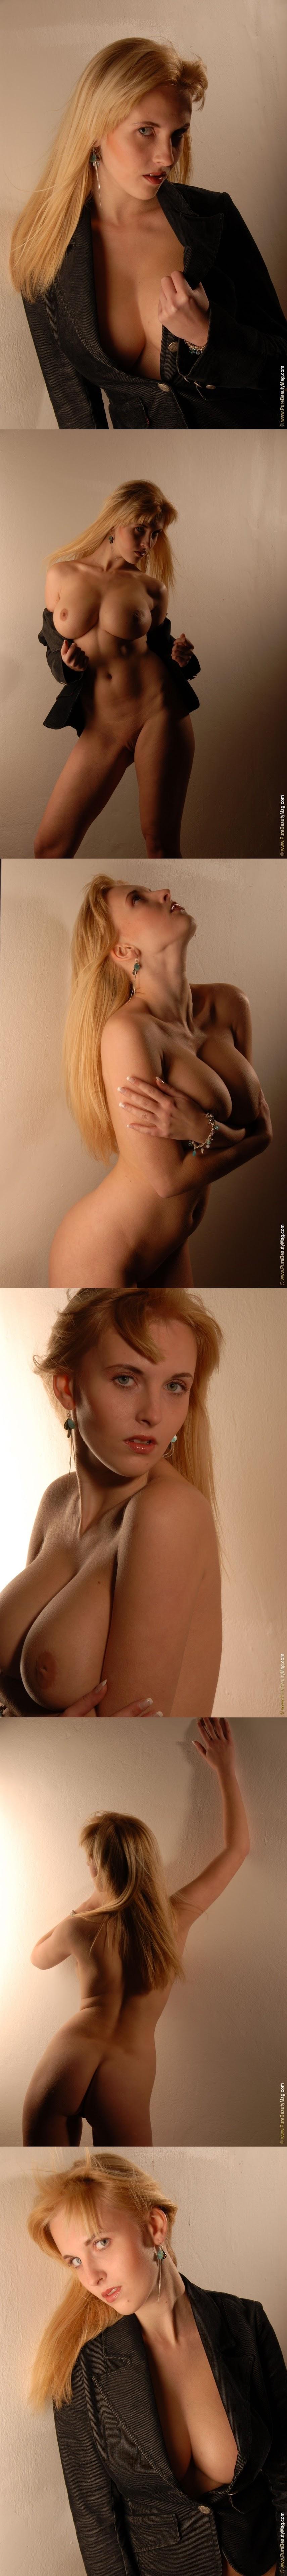 PureBeautyMag PBM  - 2007-04-27 - #s348007 - Monika - Visions - 3008px purebeautymag 08150